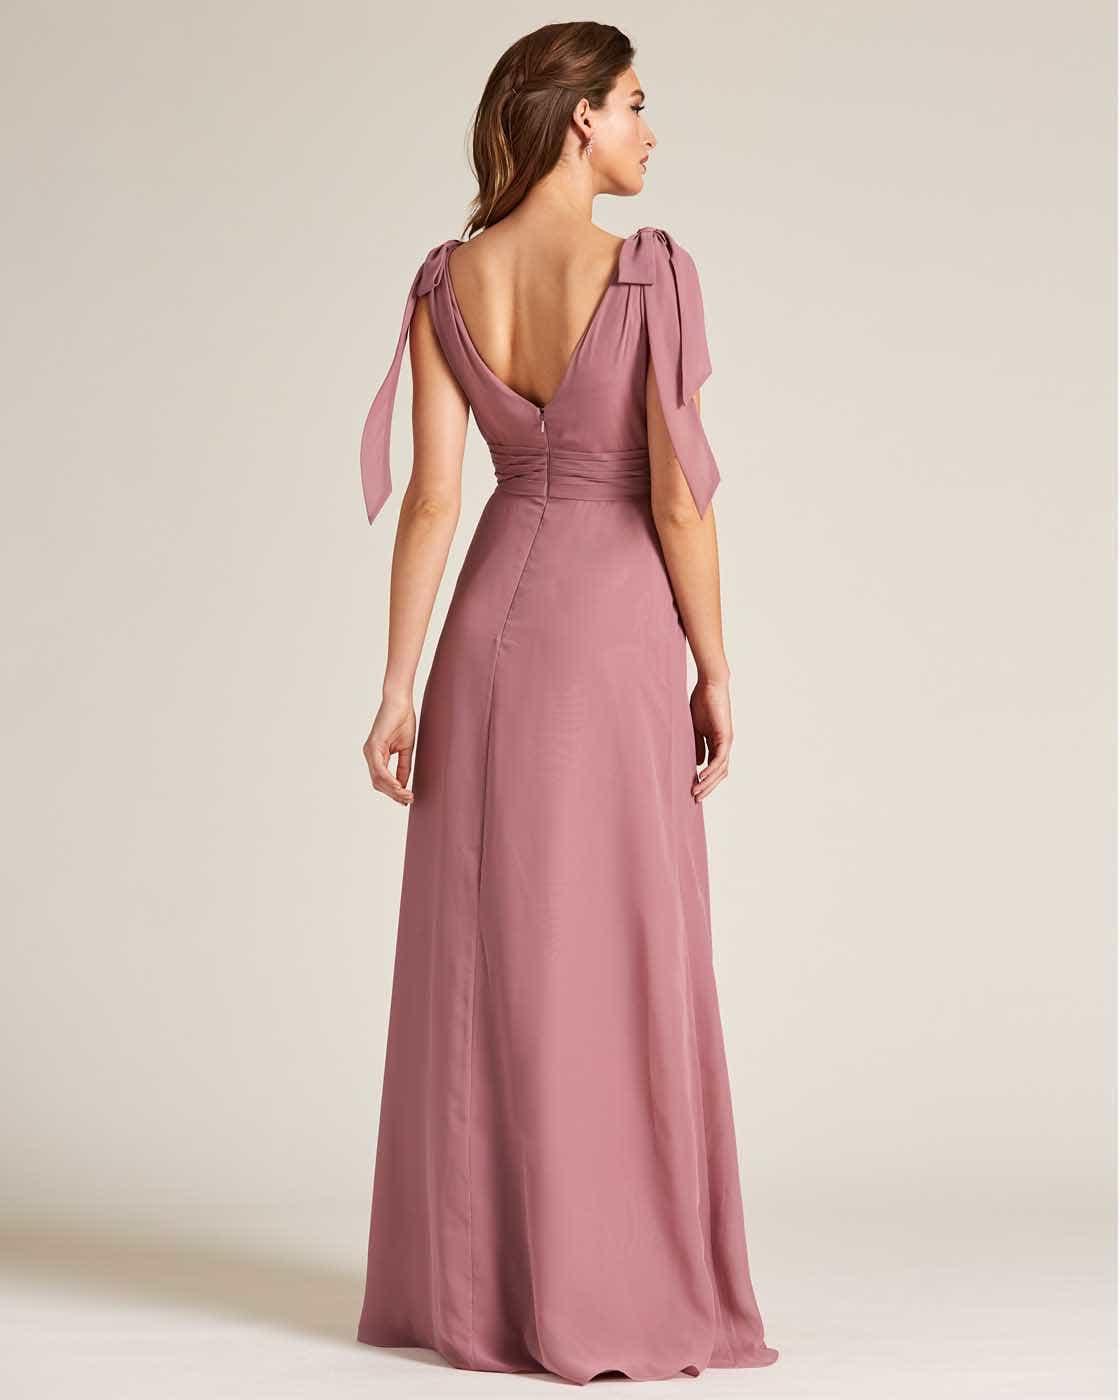 Rose Pink Bow Sleeve Long Skirt Dress - Back